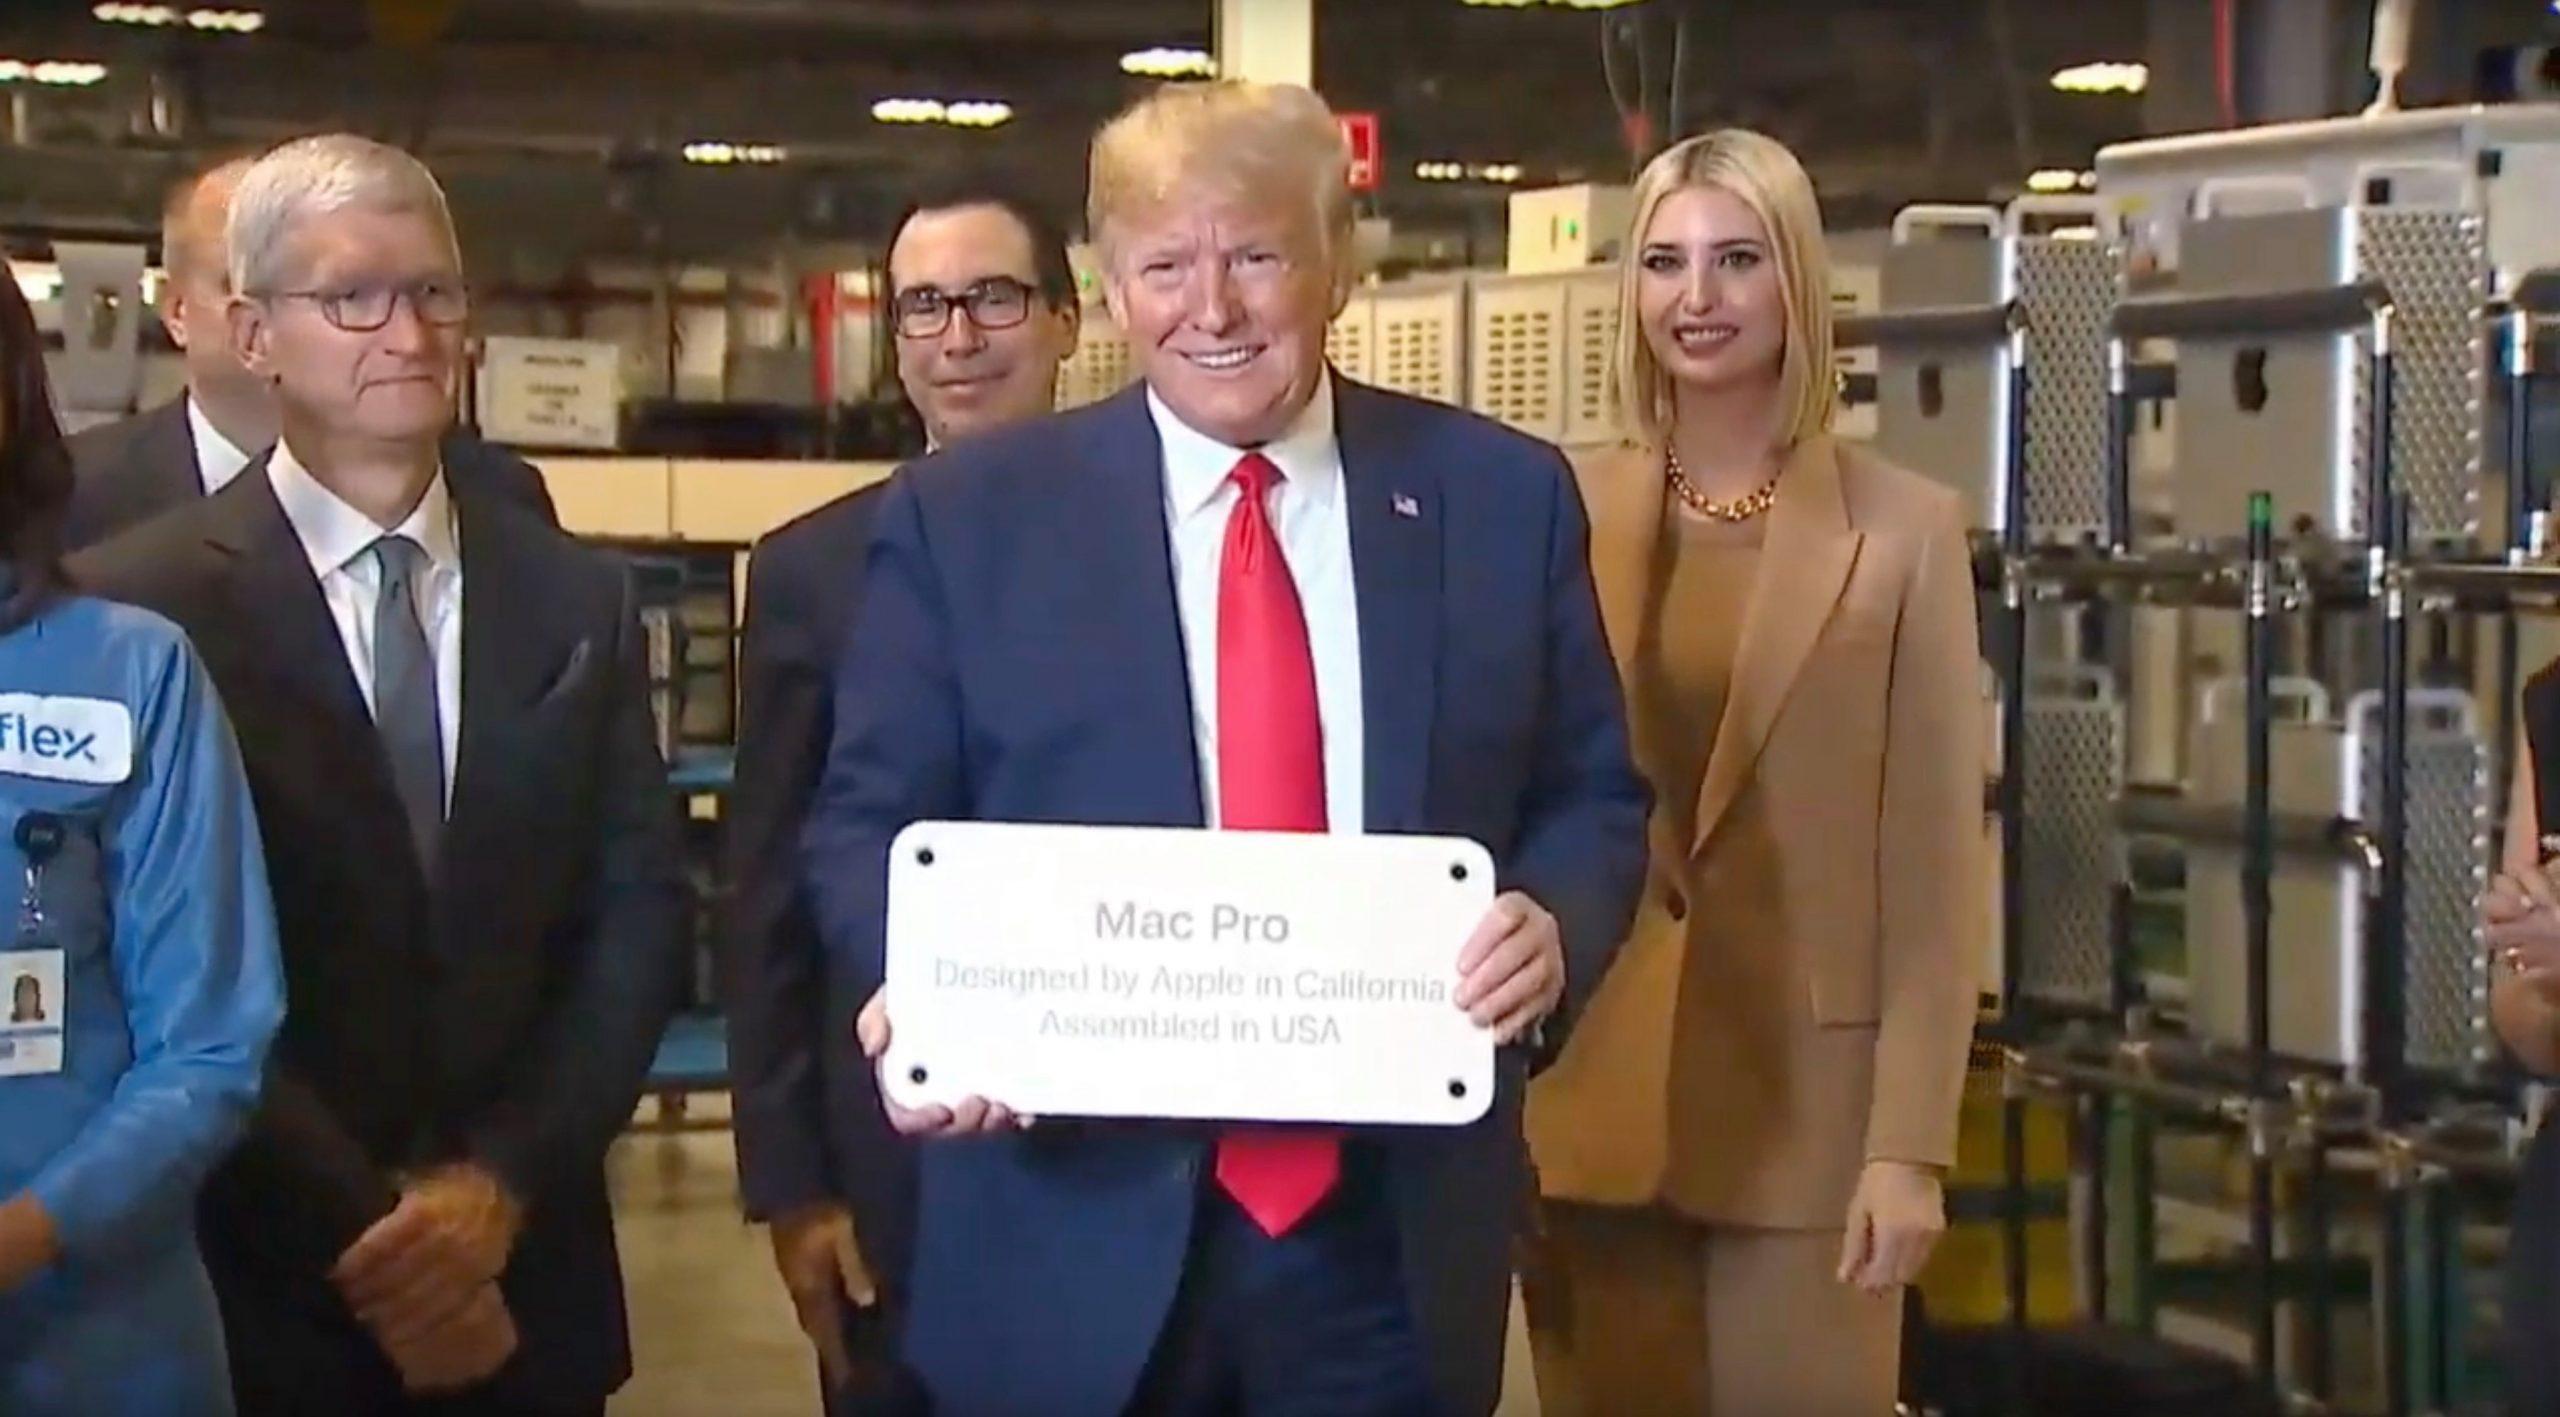 Donald Trump, Tim Cook 2019 Mac Pro